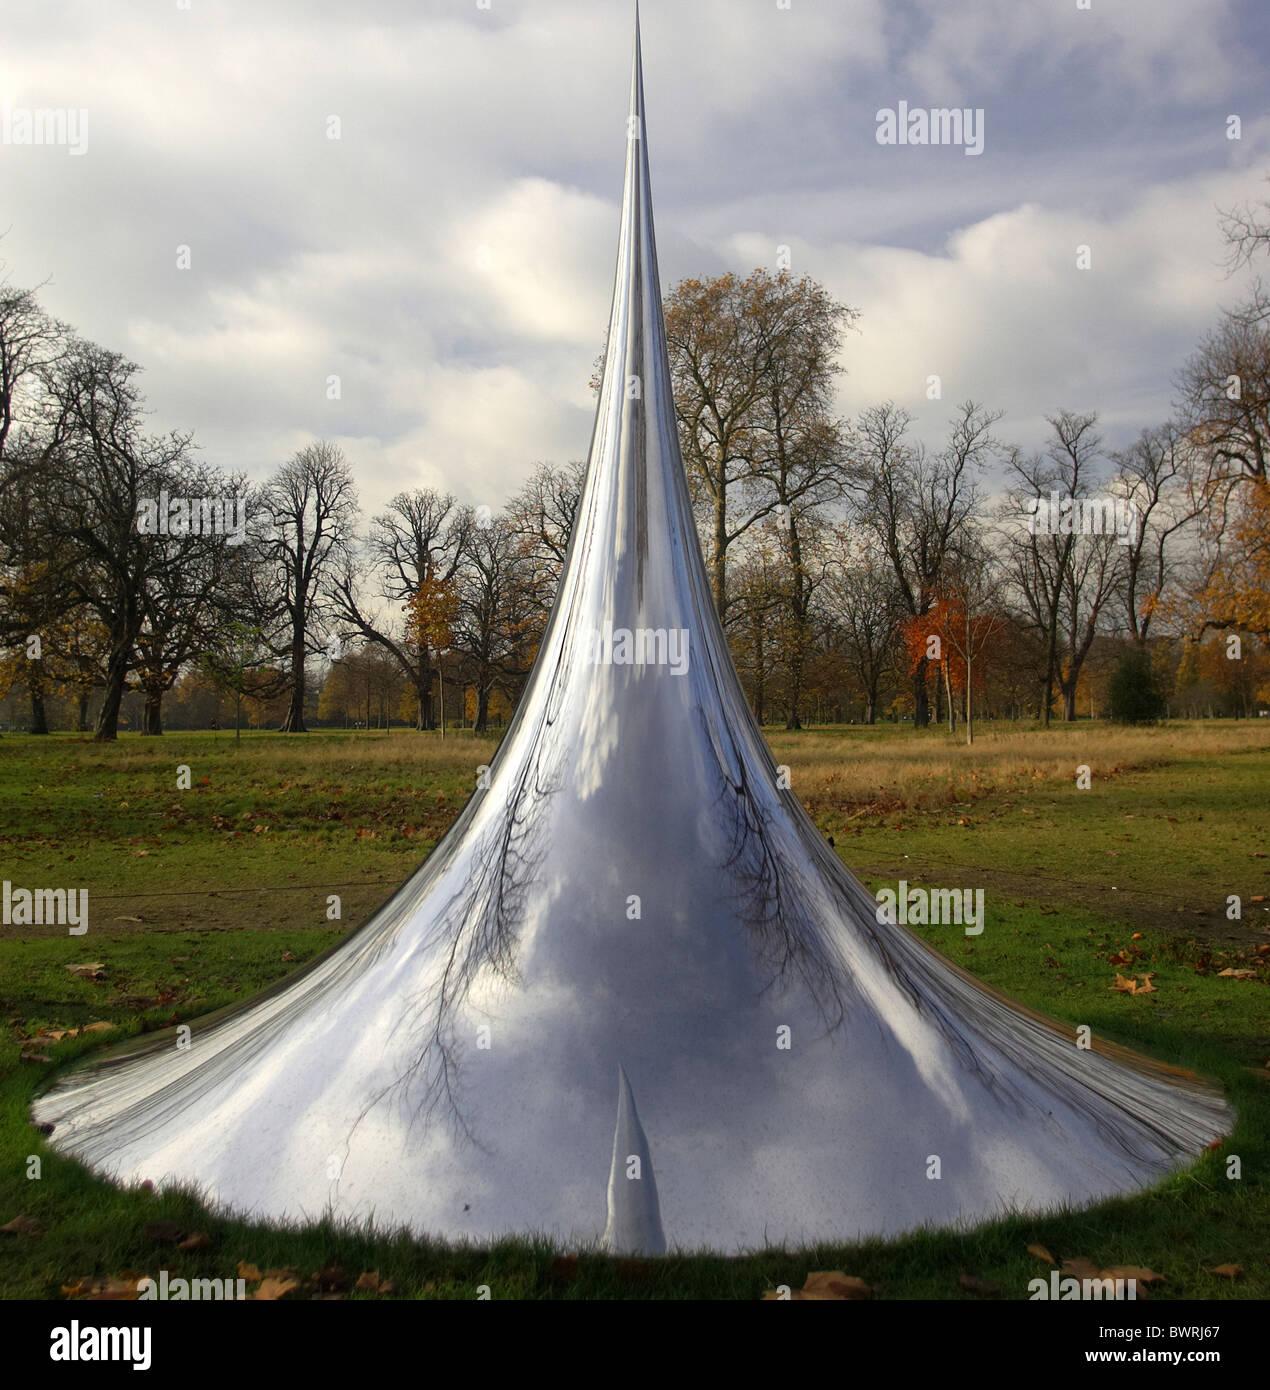 Anish Kapoor's Non Object (Spire) 2008 in Kensington Gardens - Stock Image